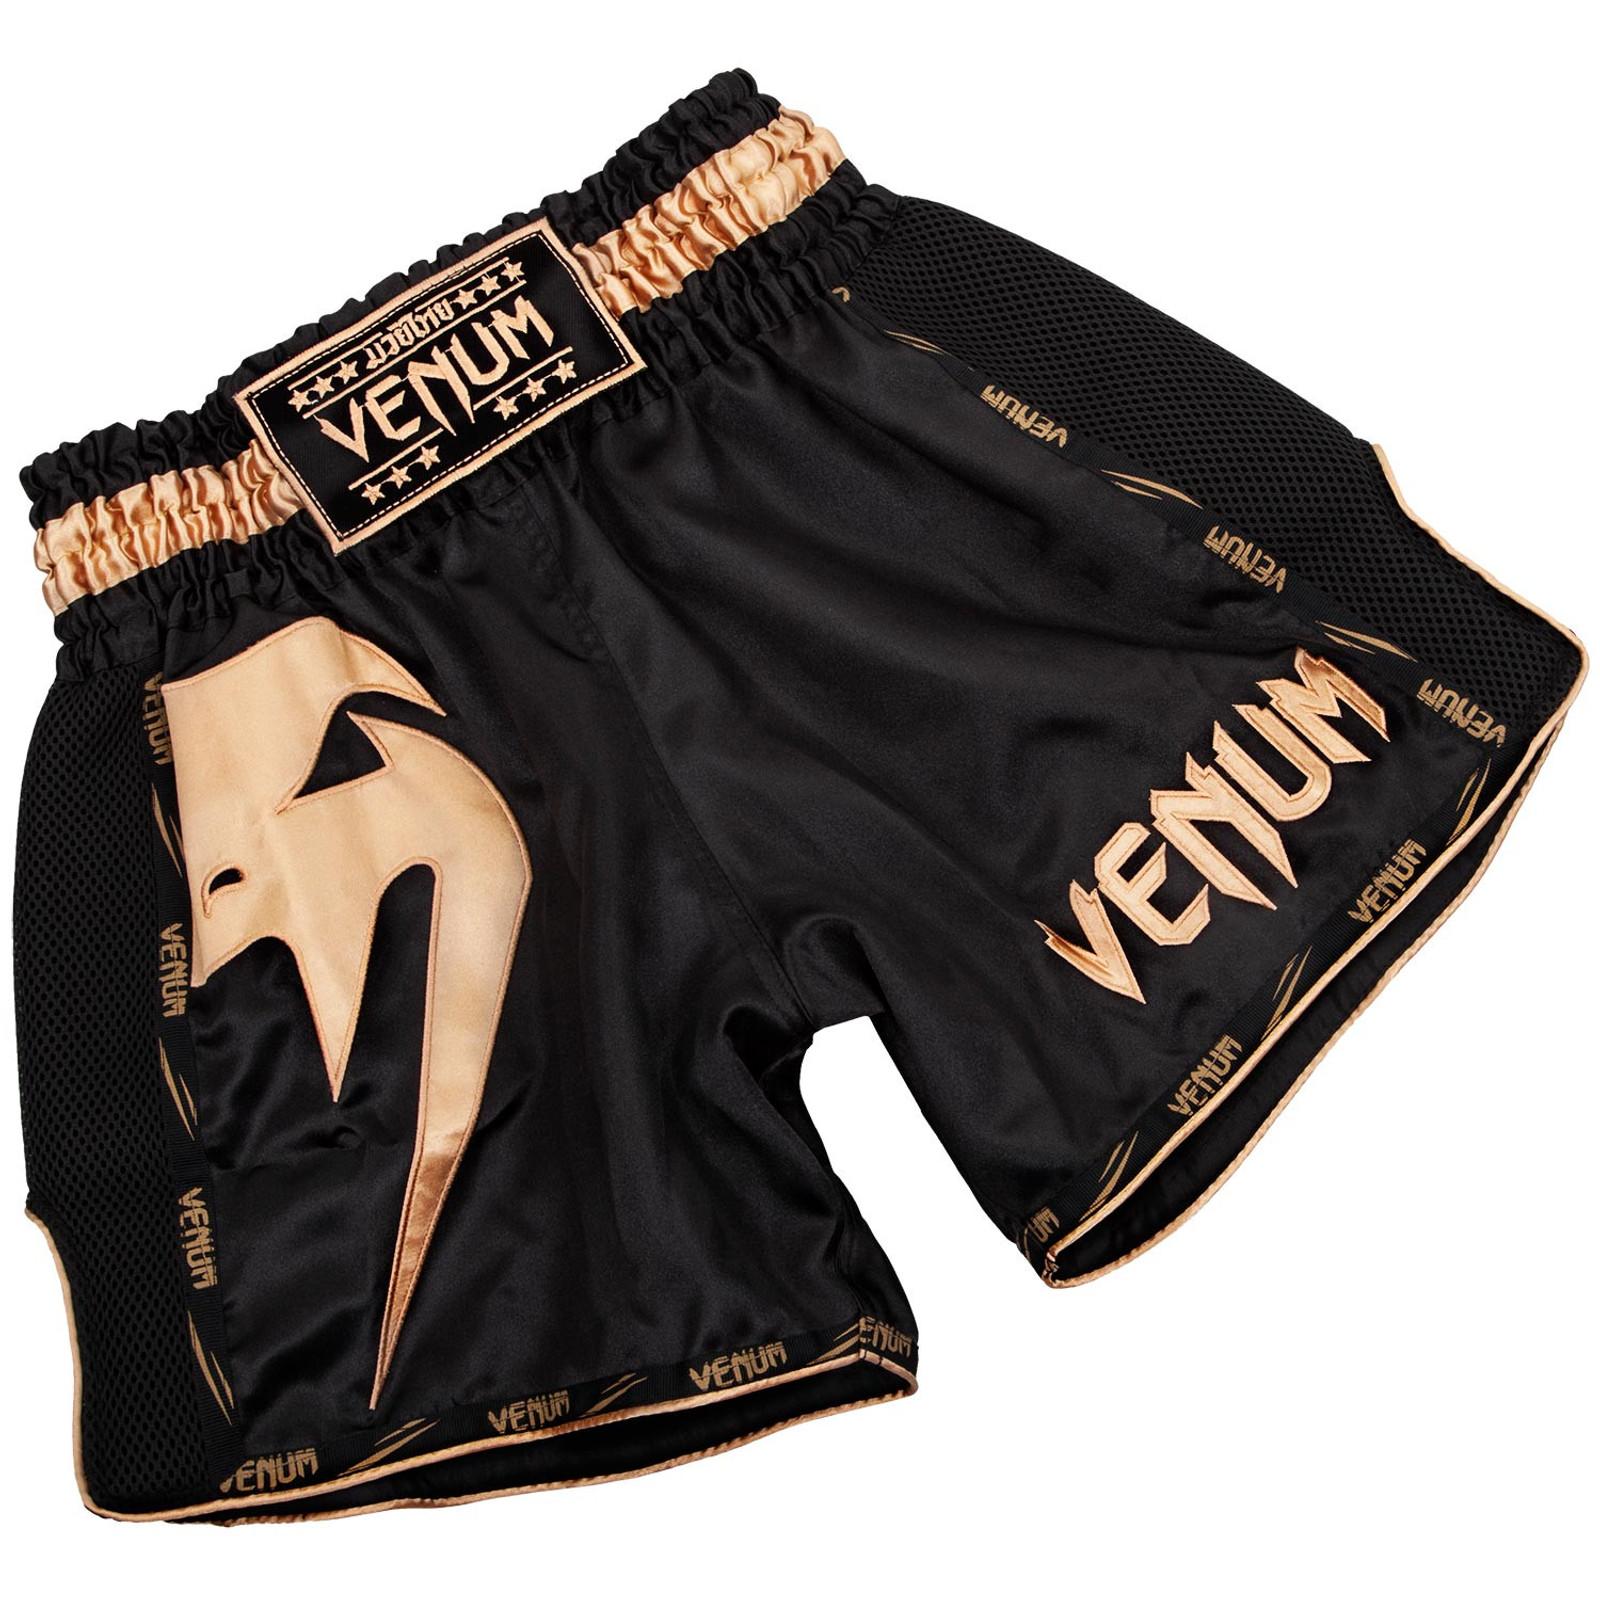 Venum Muay Thai Shorts Giant